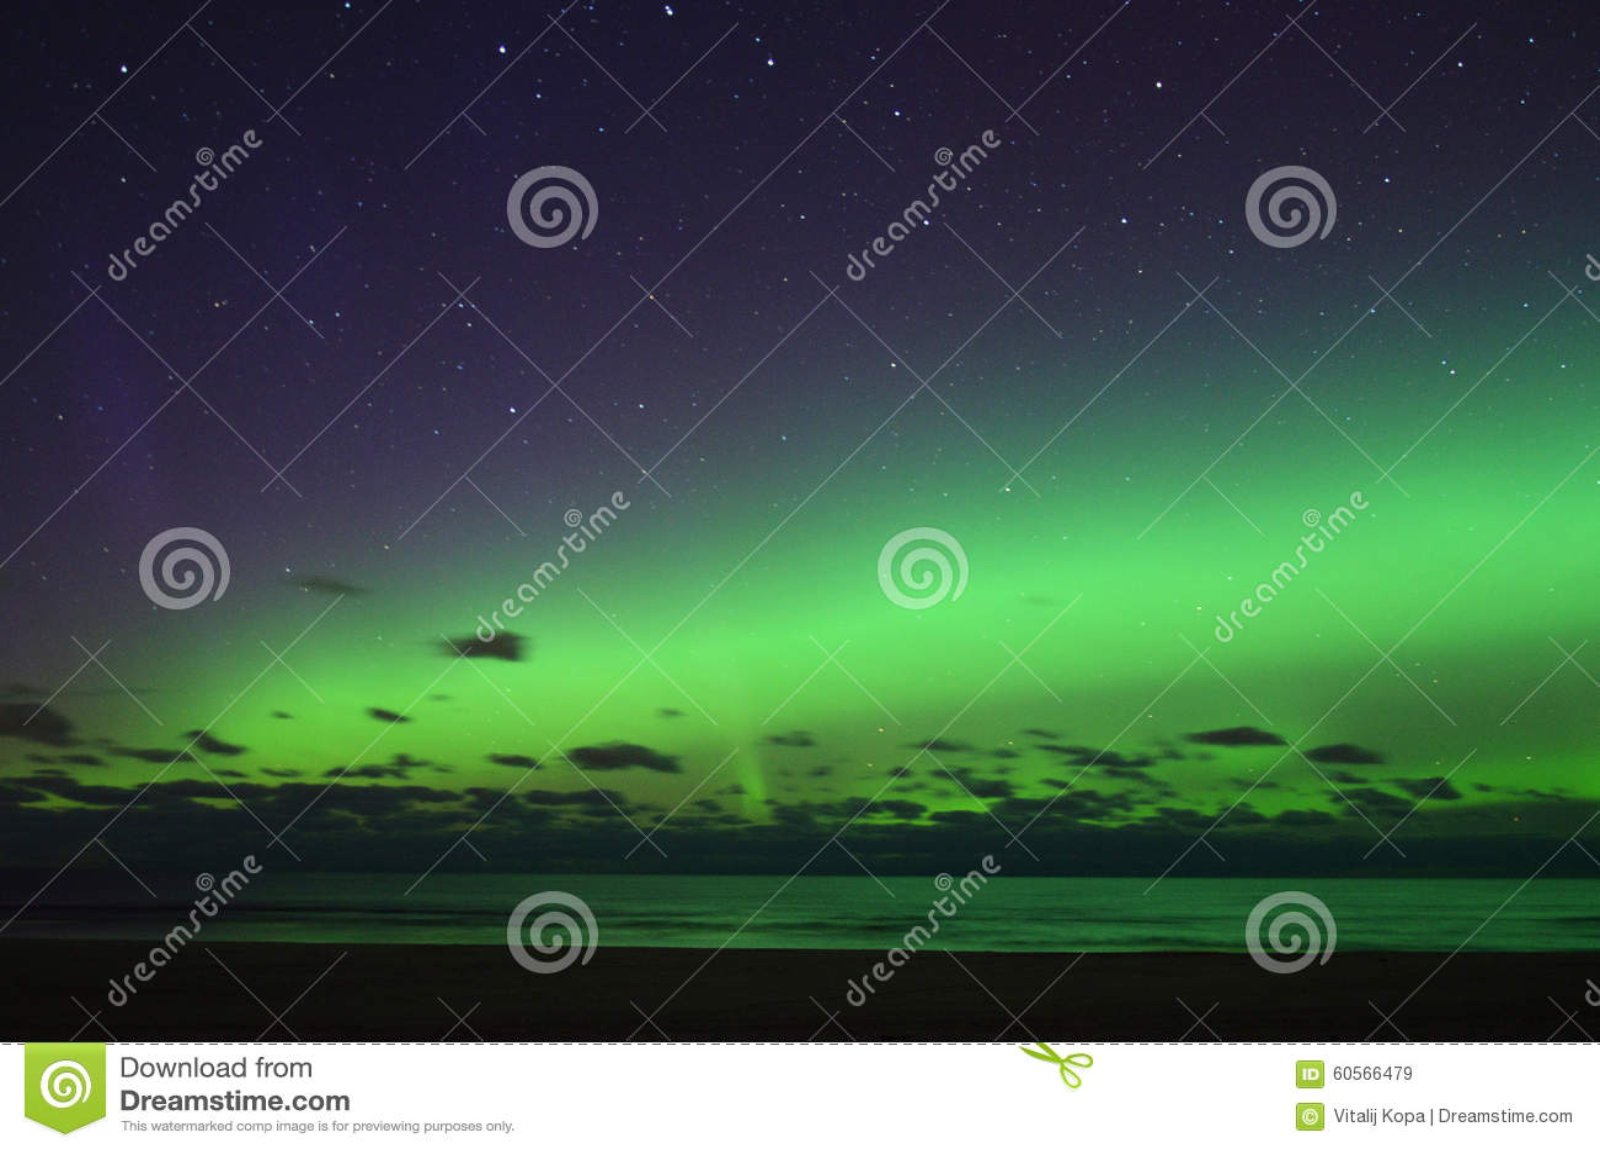 Aurora polar lights and night sky stars over sea